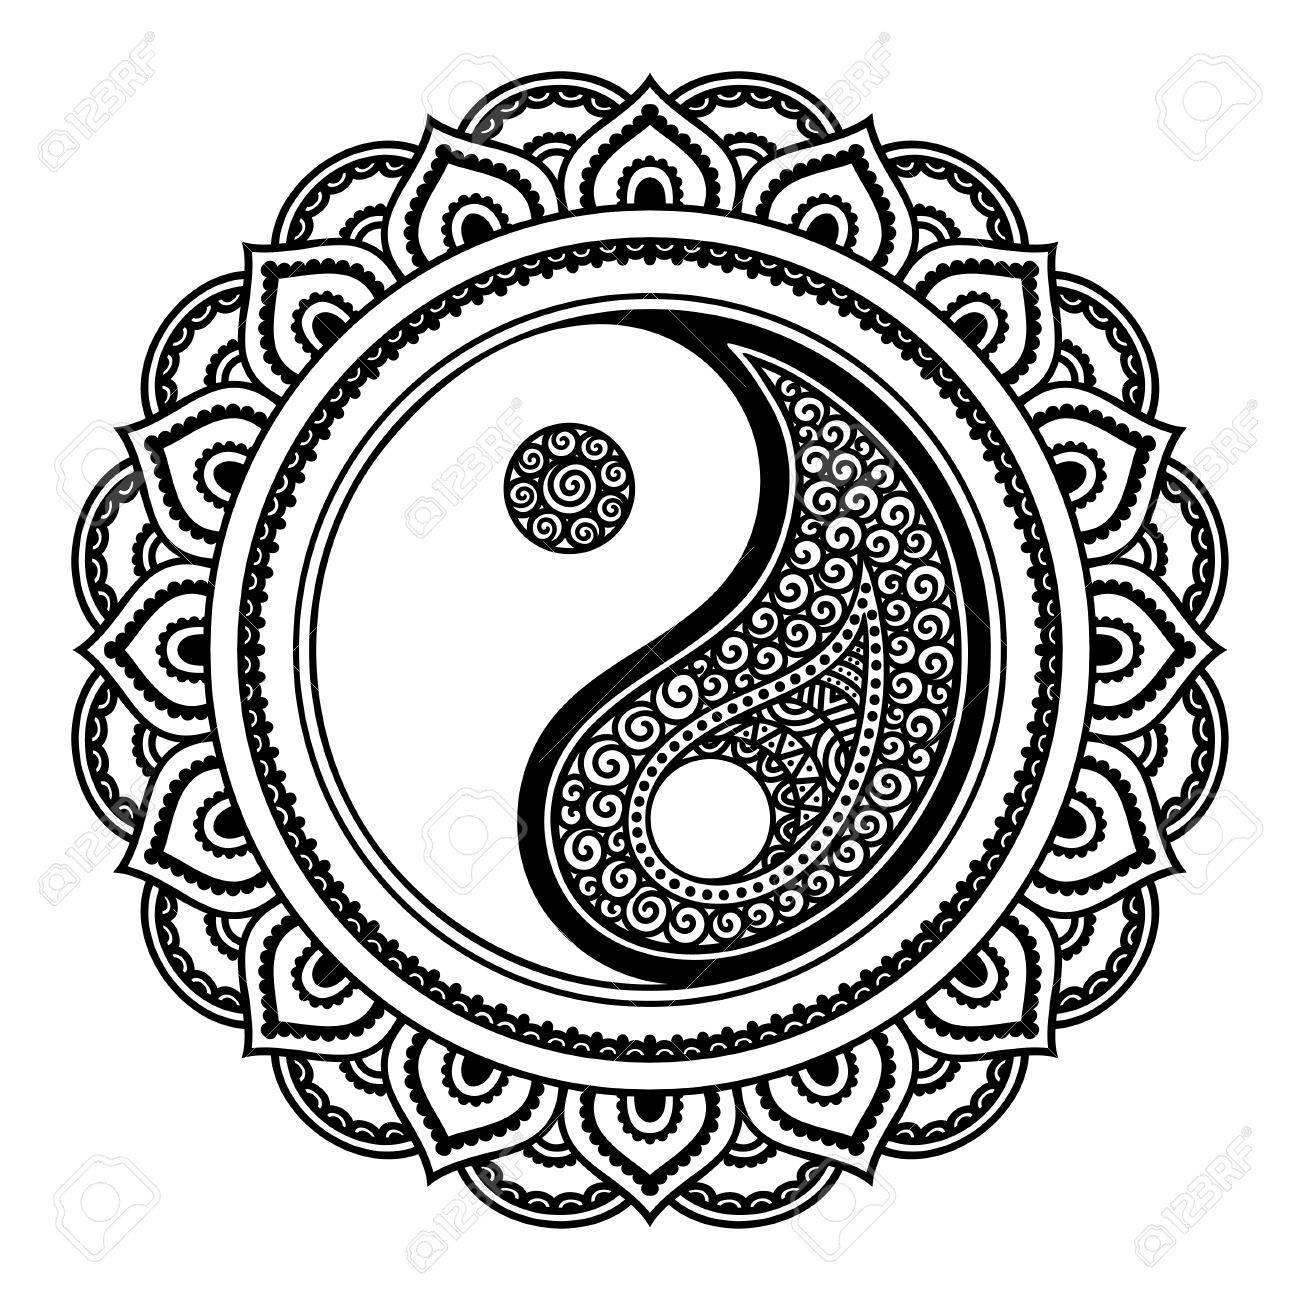 Yin Yang Drawing Design At Getdrawings